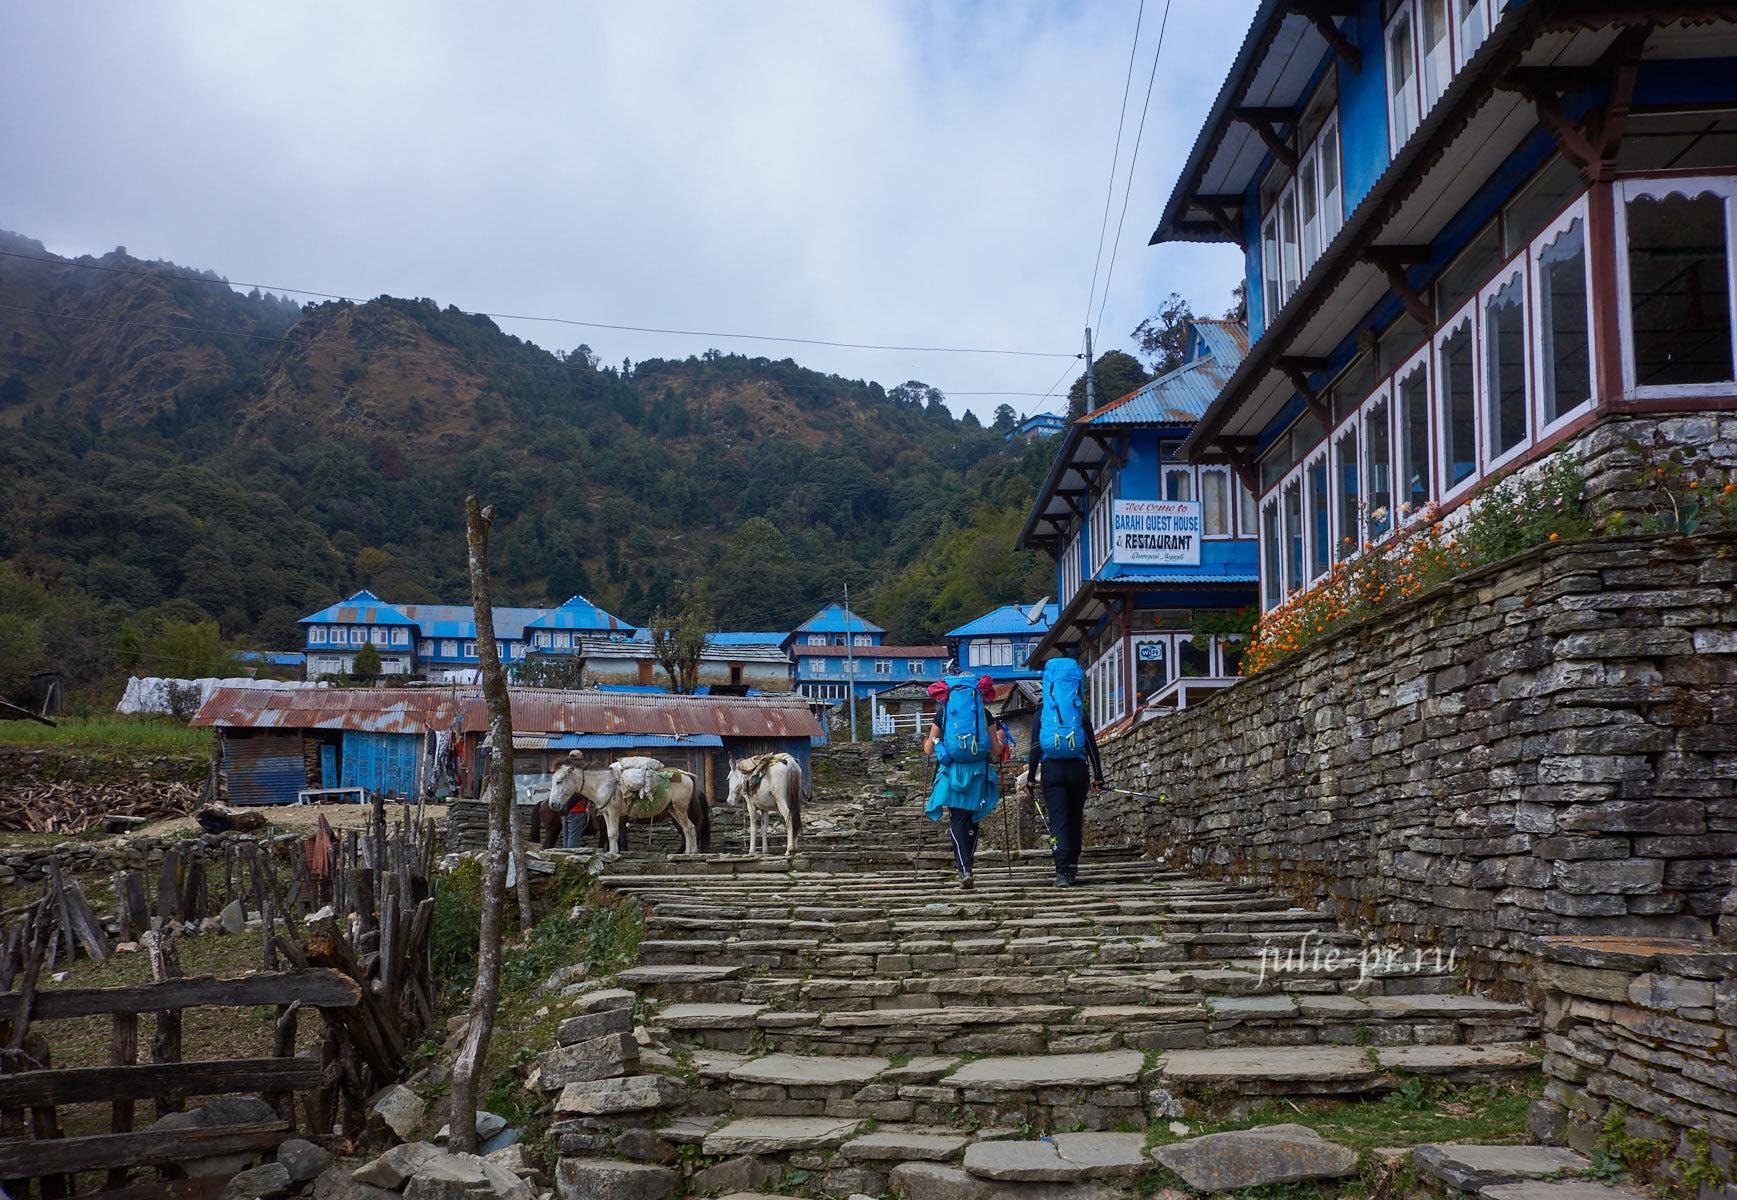 Непал, Пун-Хилл трек, Деревня Горепани